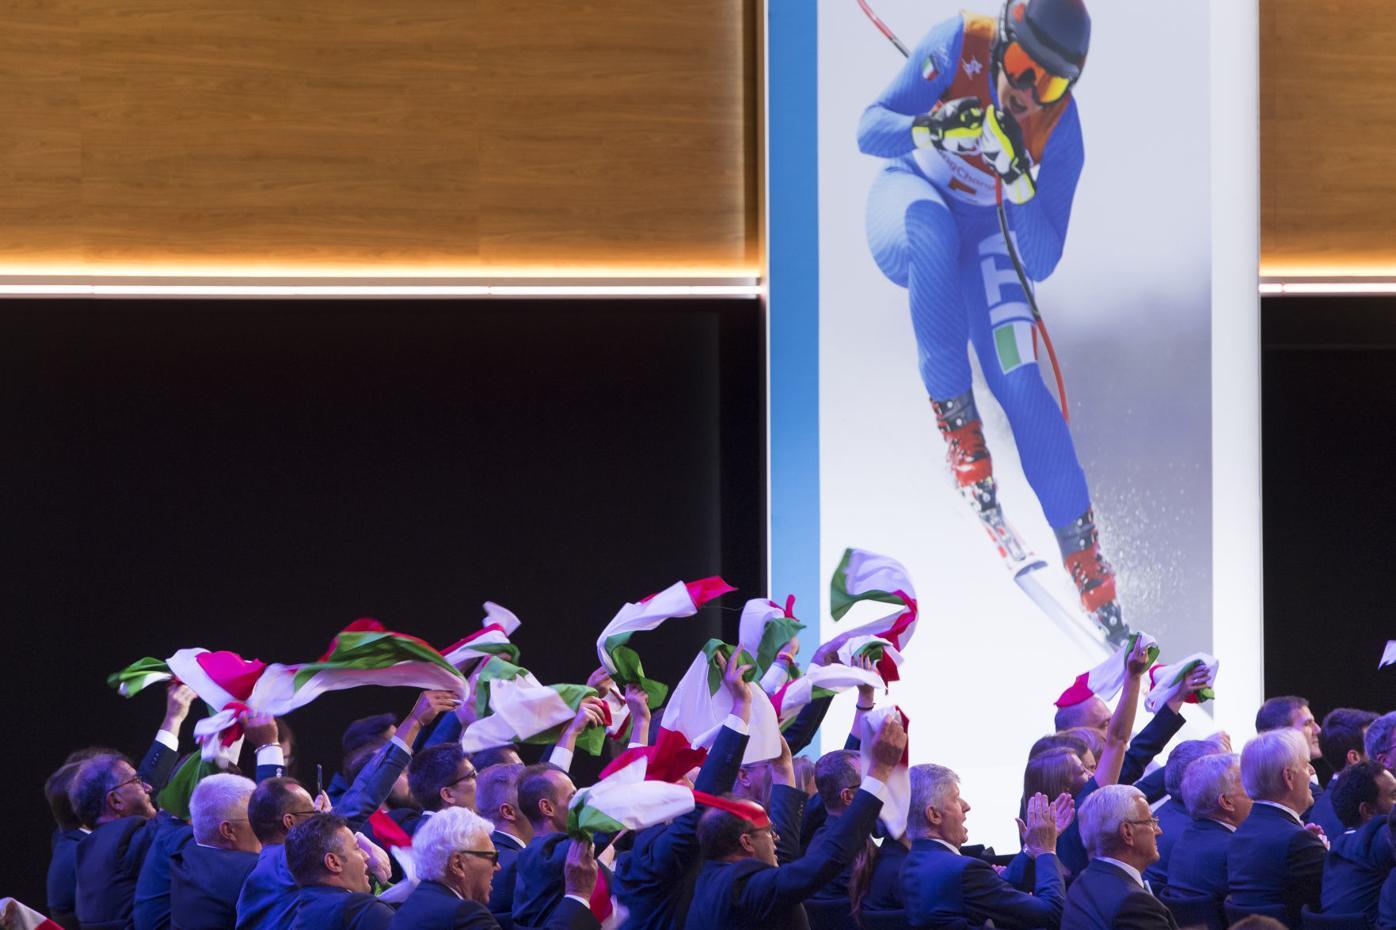 Switzerland 2026 Olympics Bids